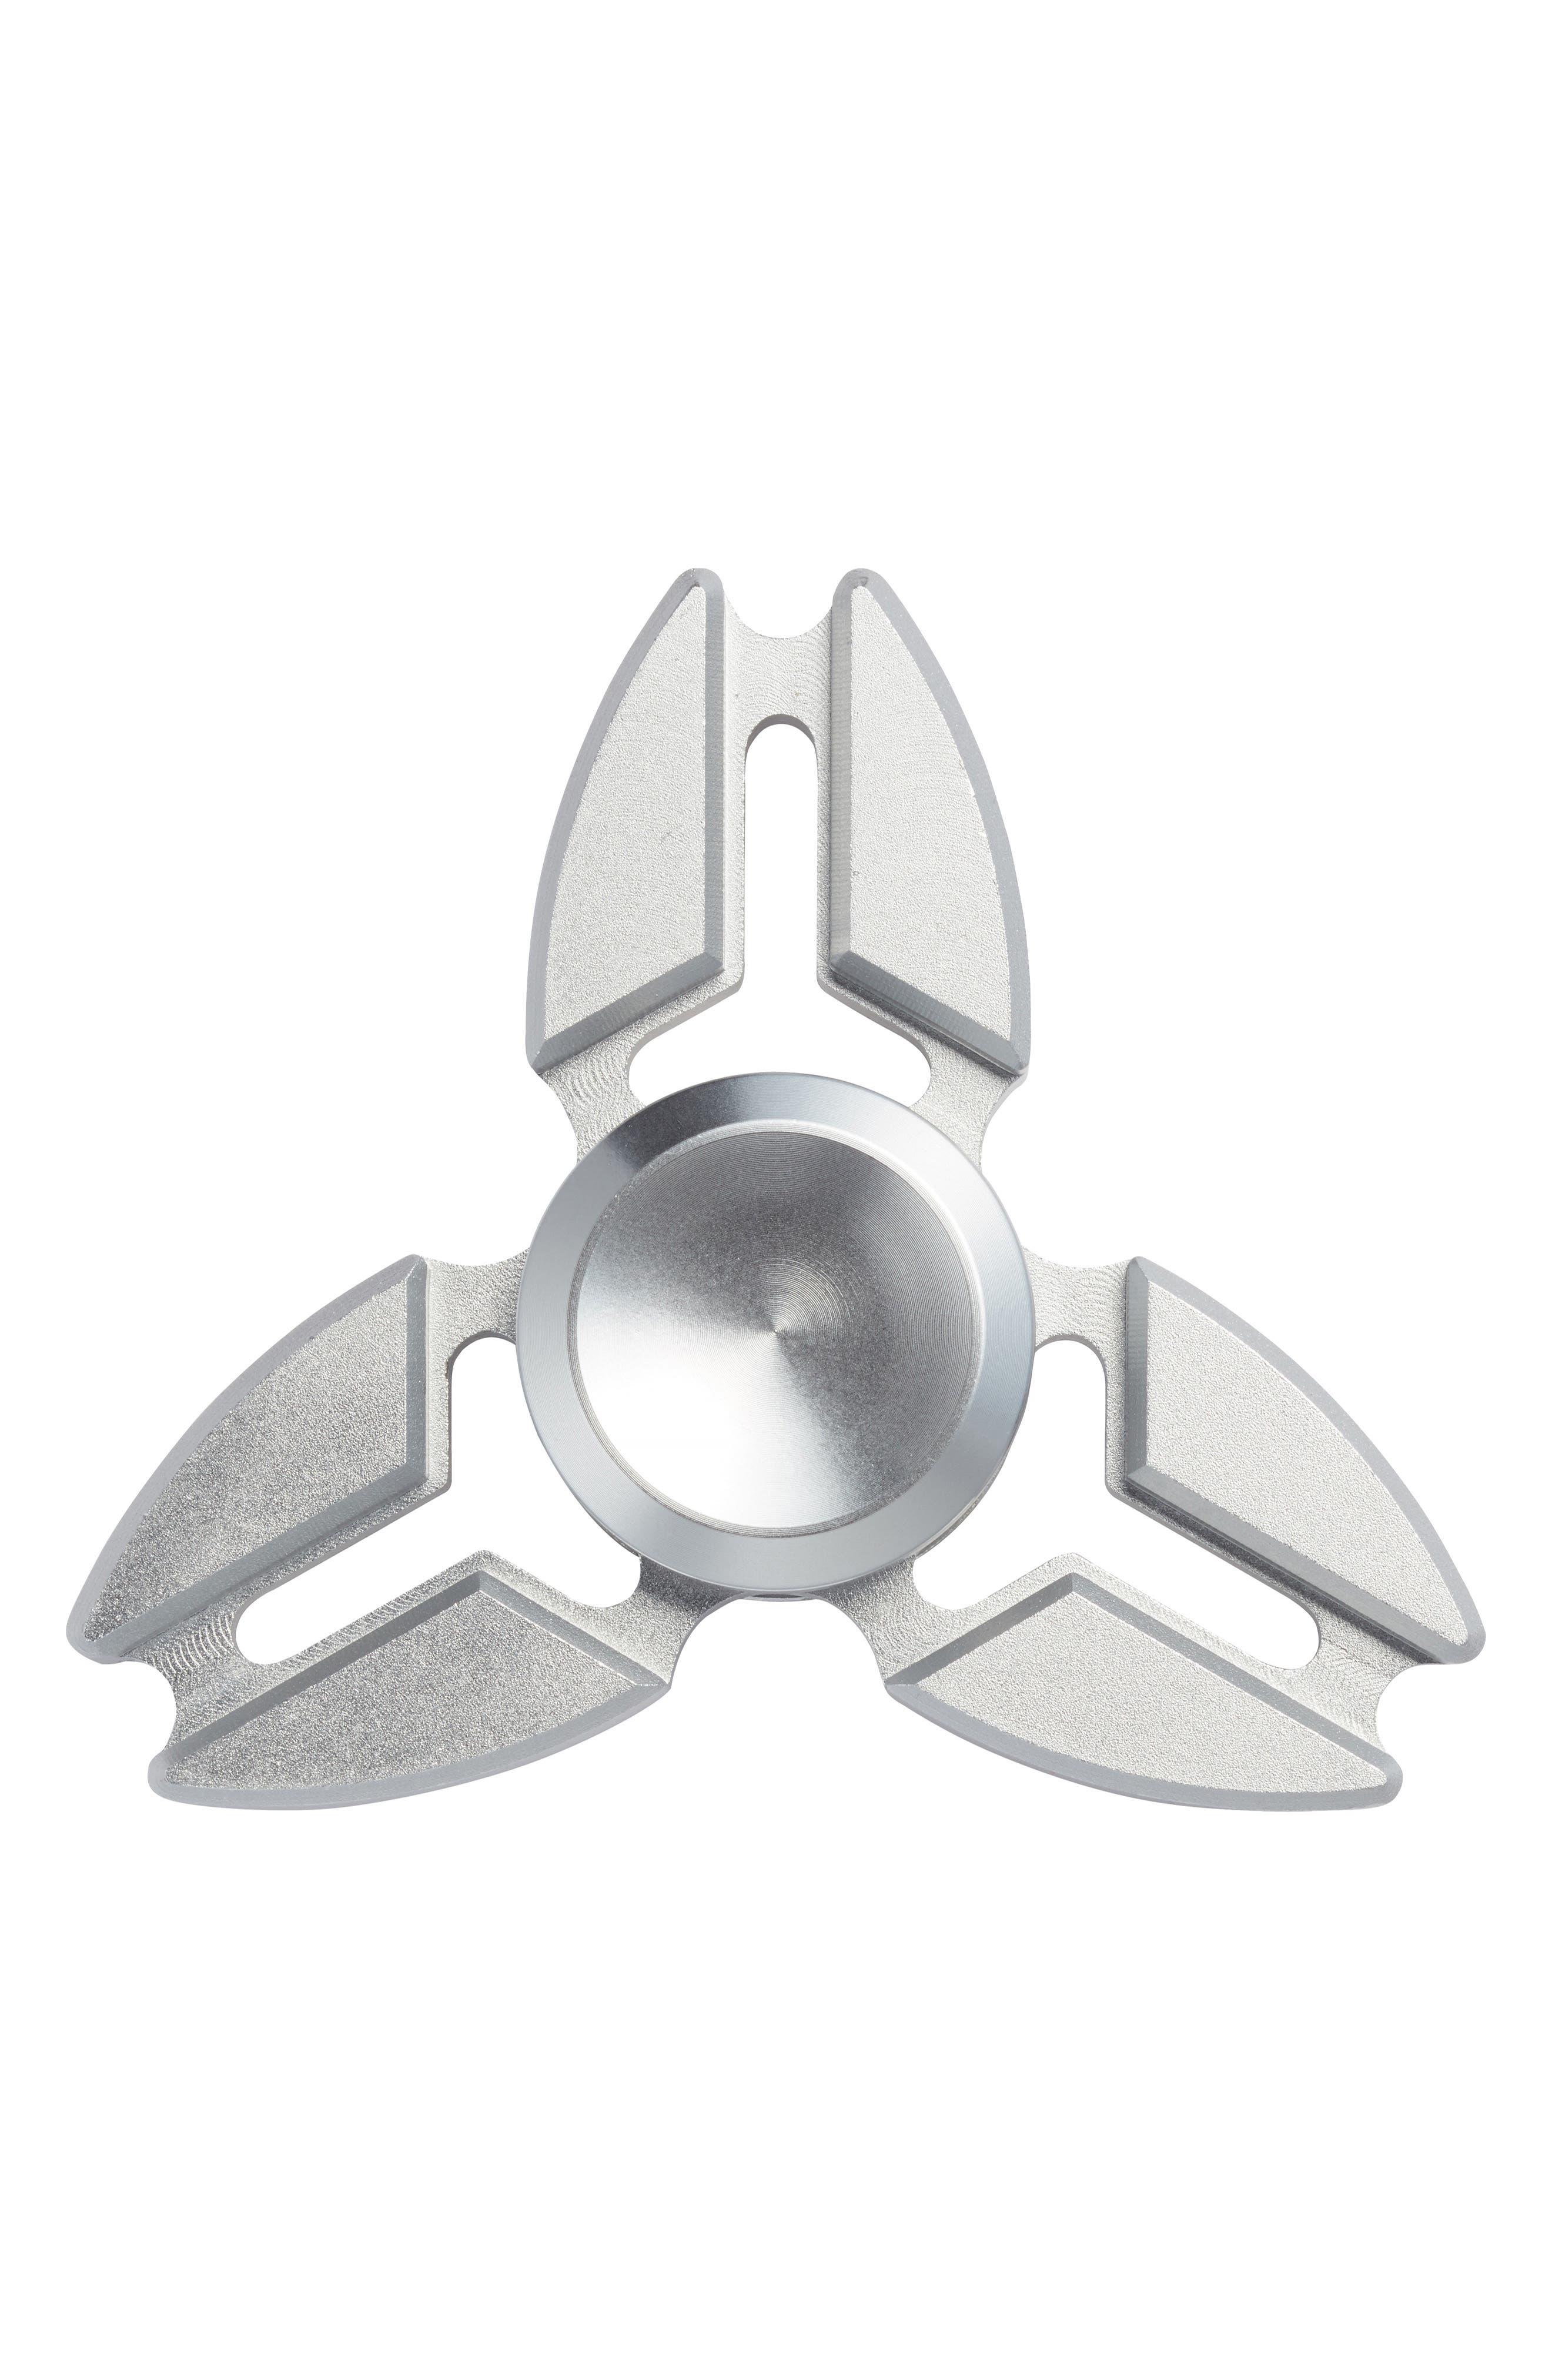 Addictive Fidget Toys Coulee Tri Bar Fidget Spinner,                             Main thumbnail 1, color,                             Silver